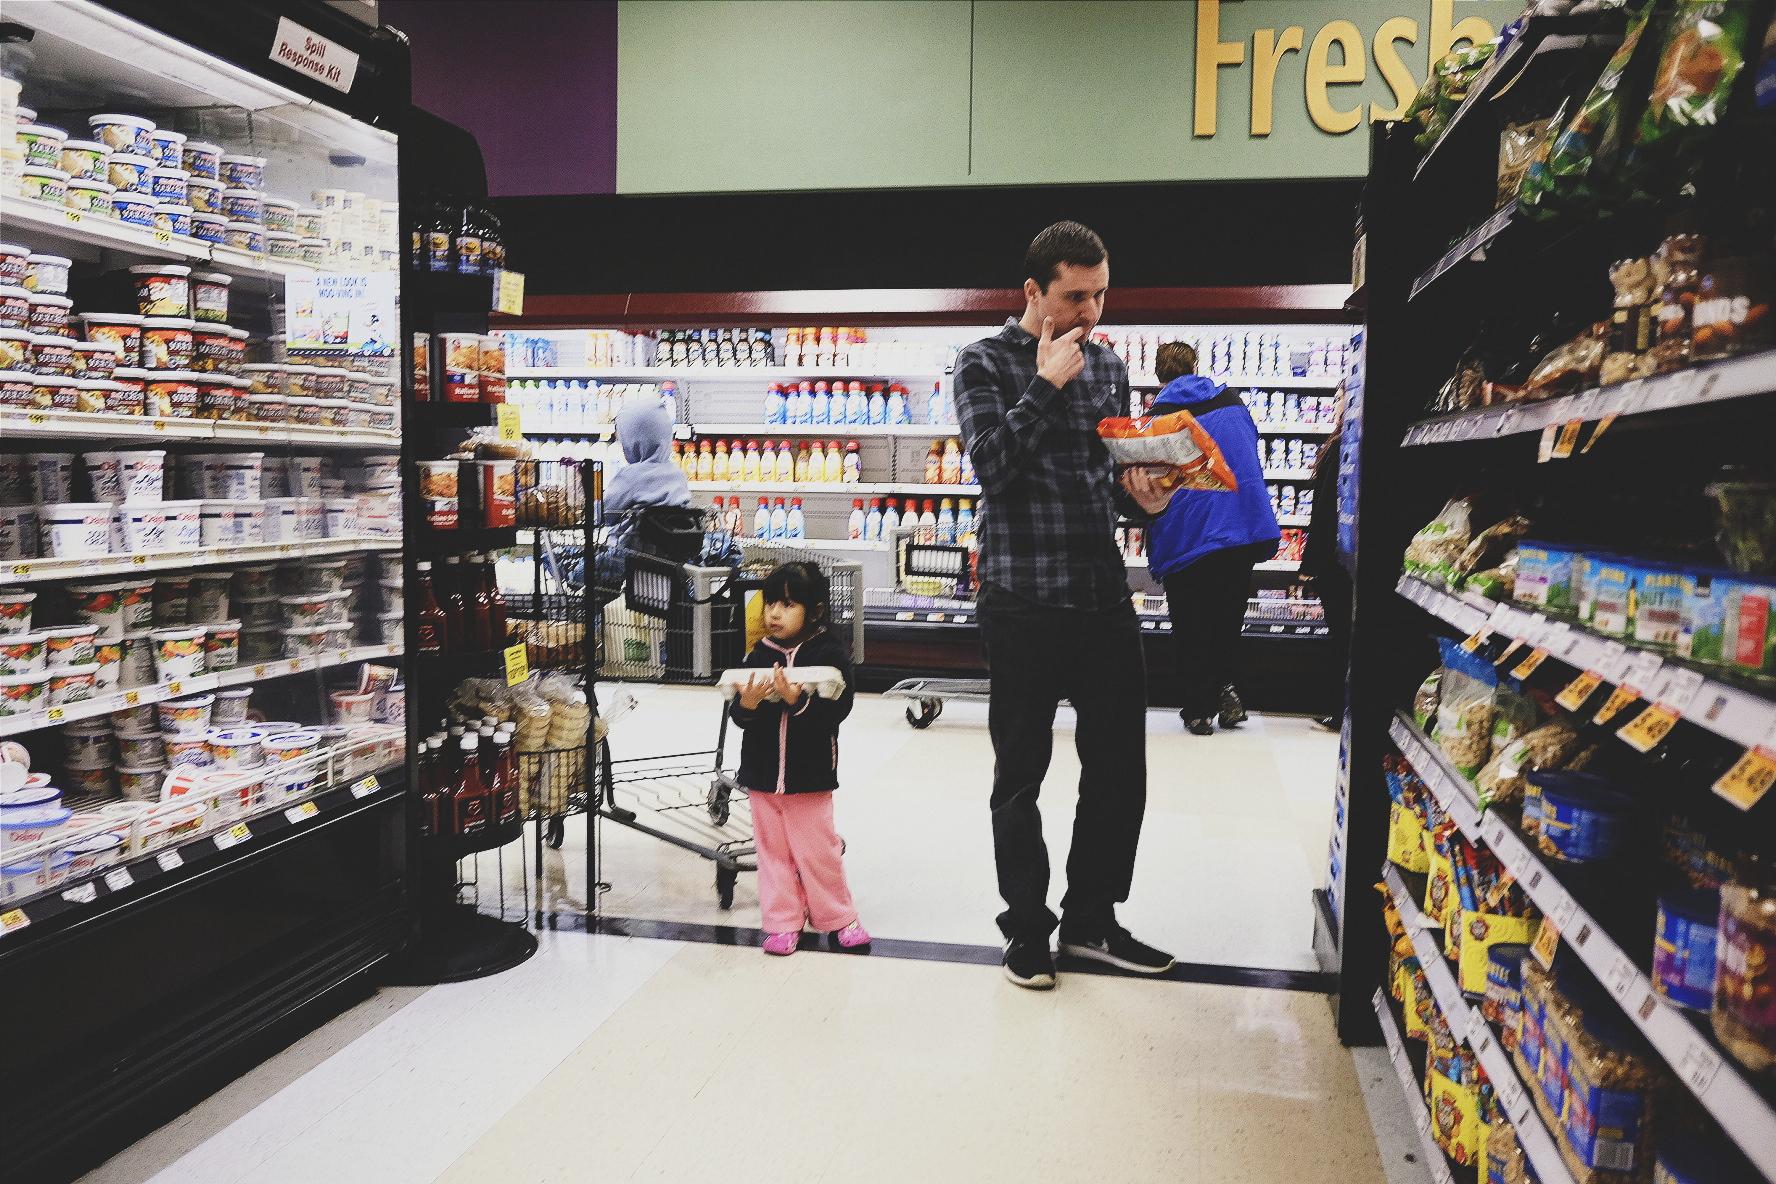 62. Shopping